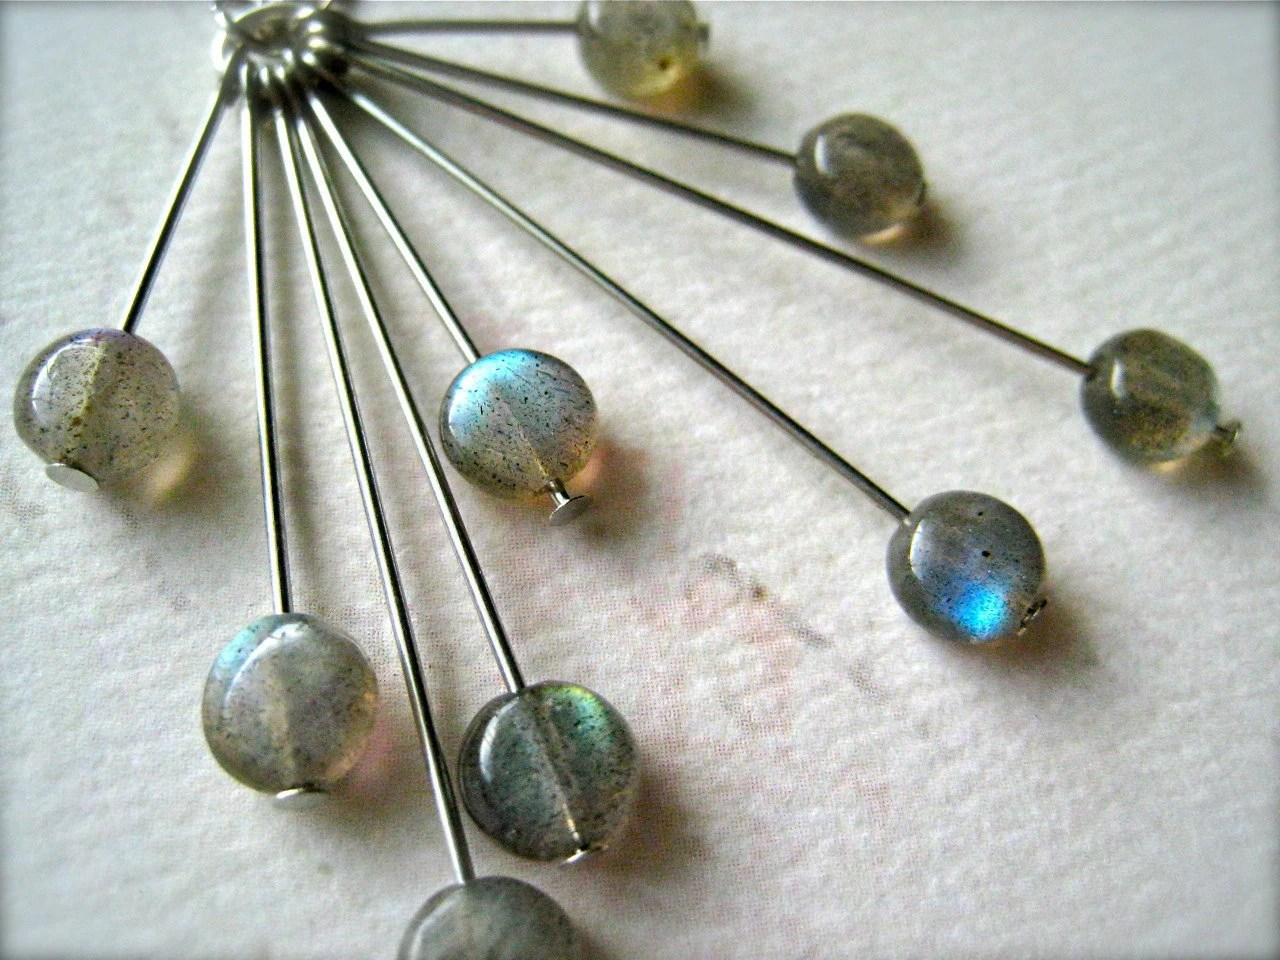 lightning storm necklace - labradorite mod necklace, sunburst, handmade, organic, ethereal, N12, labradorite jewelry - FoamyWader